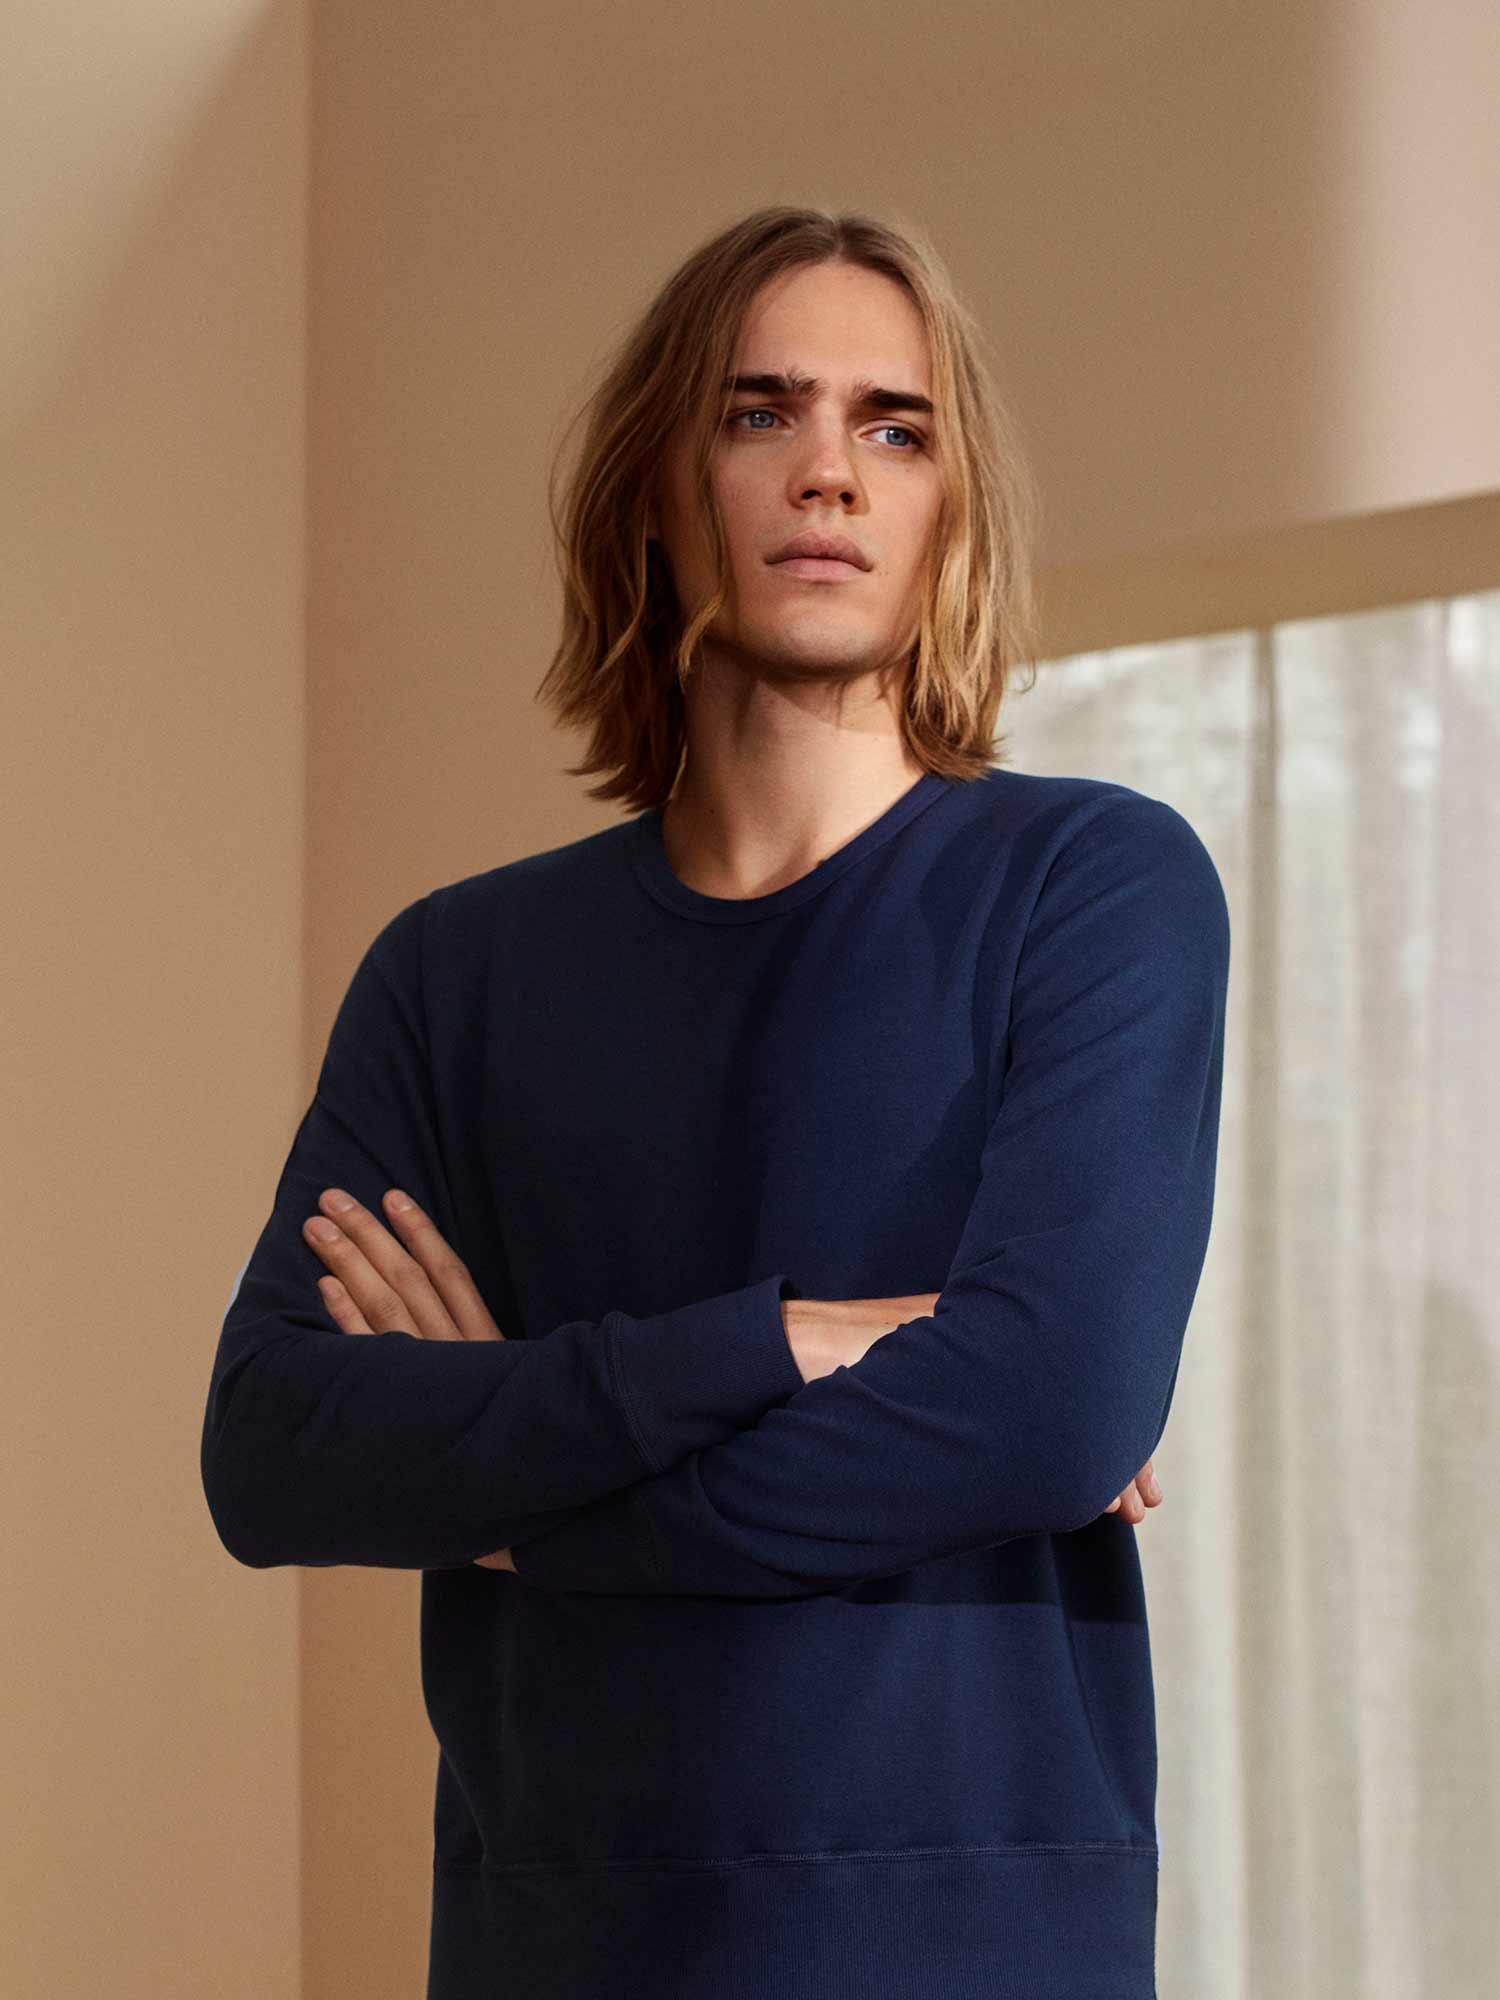 Hoge kwaliteit loungewear voor mannen | mey®